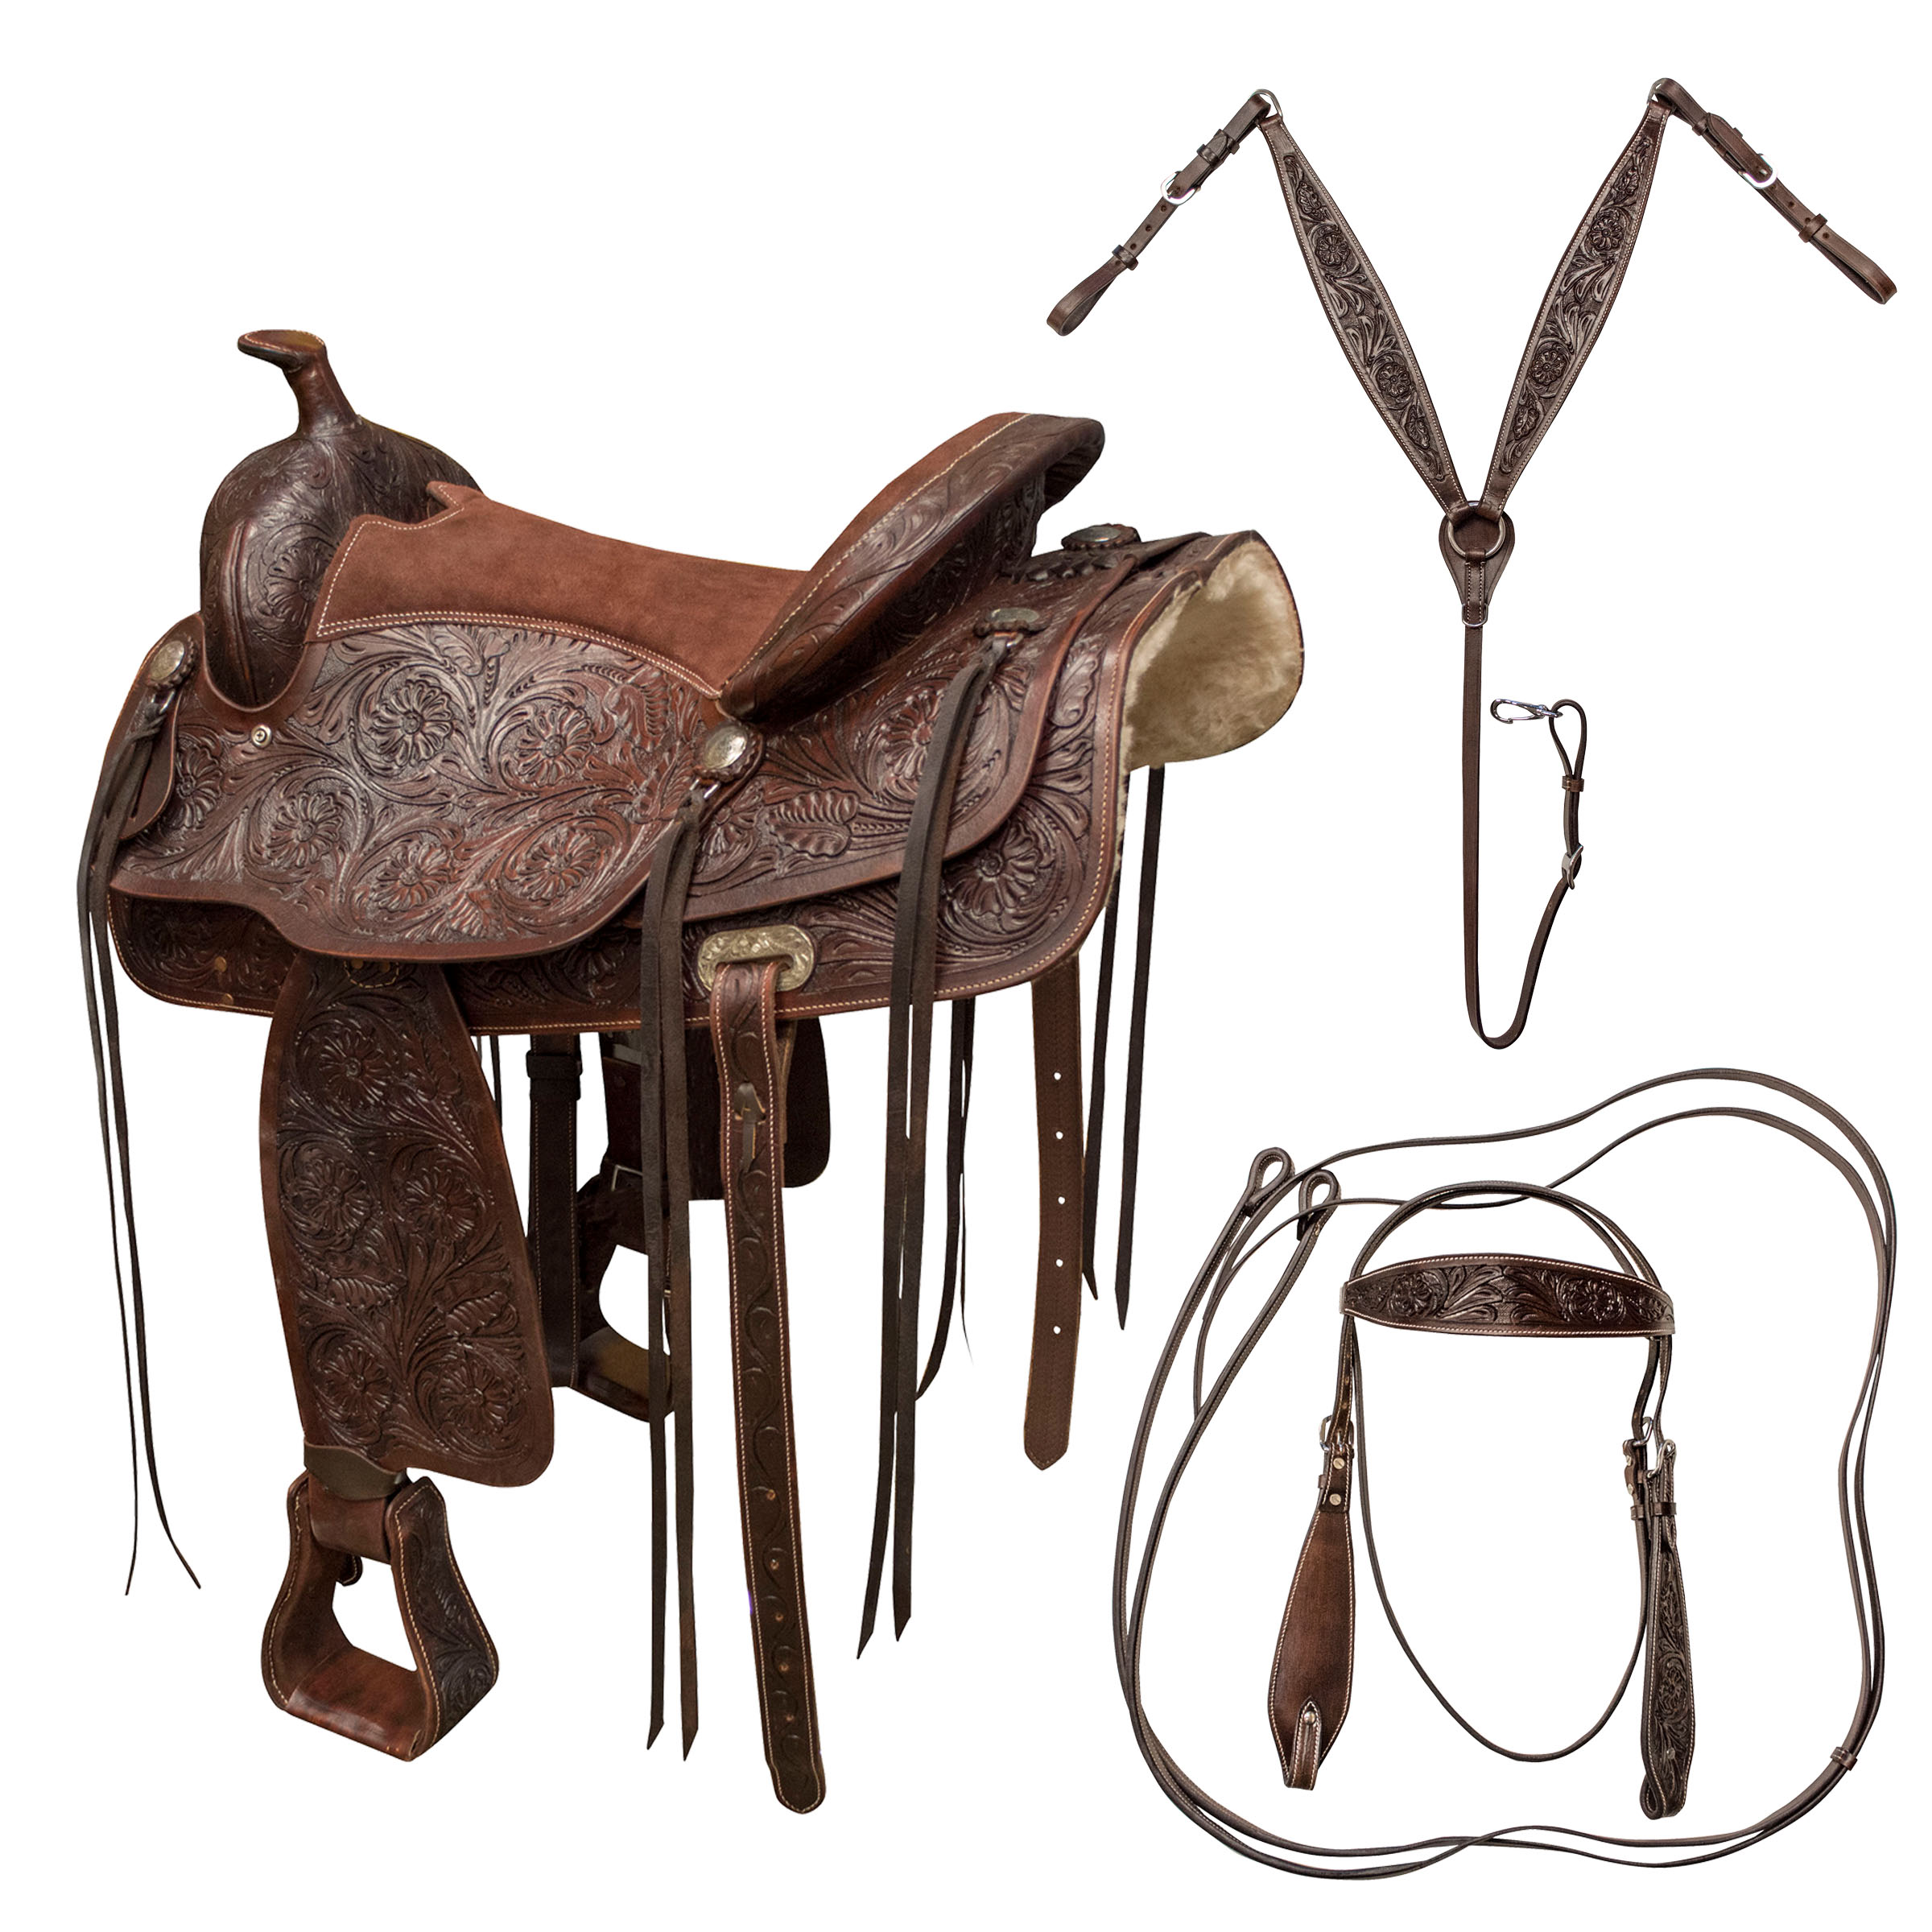 16 inch Western Saddle